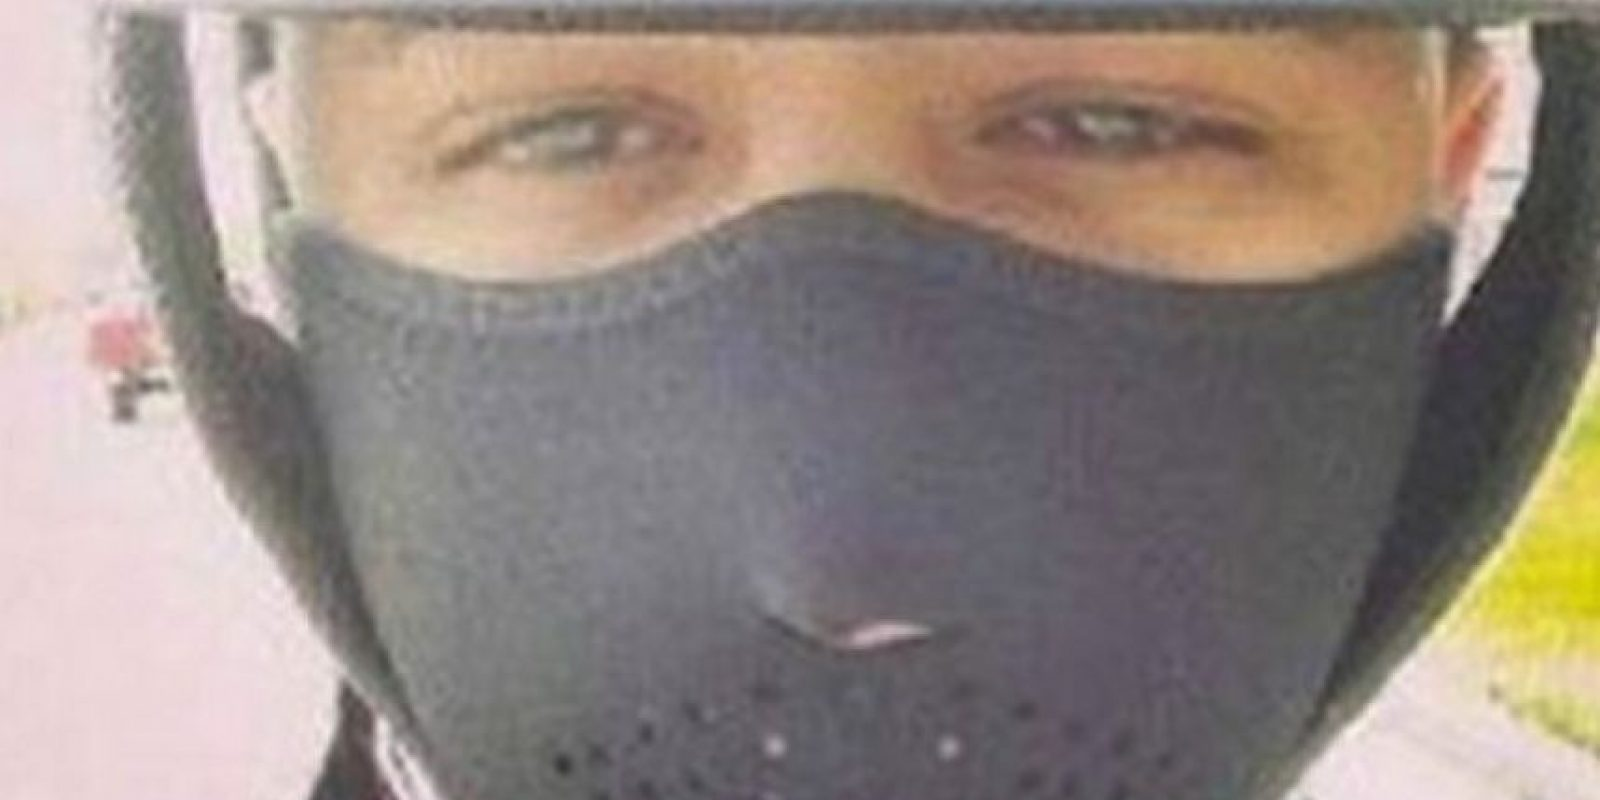 Jadiel, reggaetonero, murió en su moto por este selfie. Foto:Vía Twitter